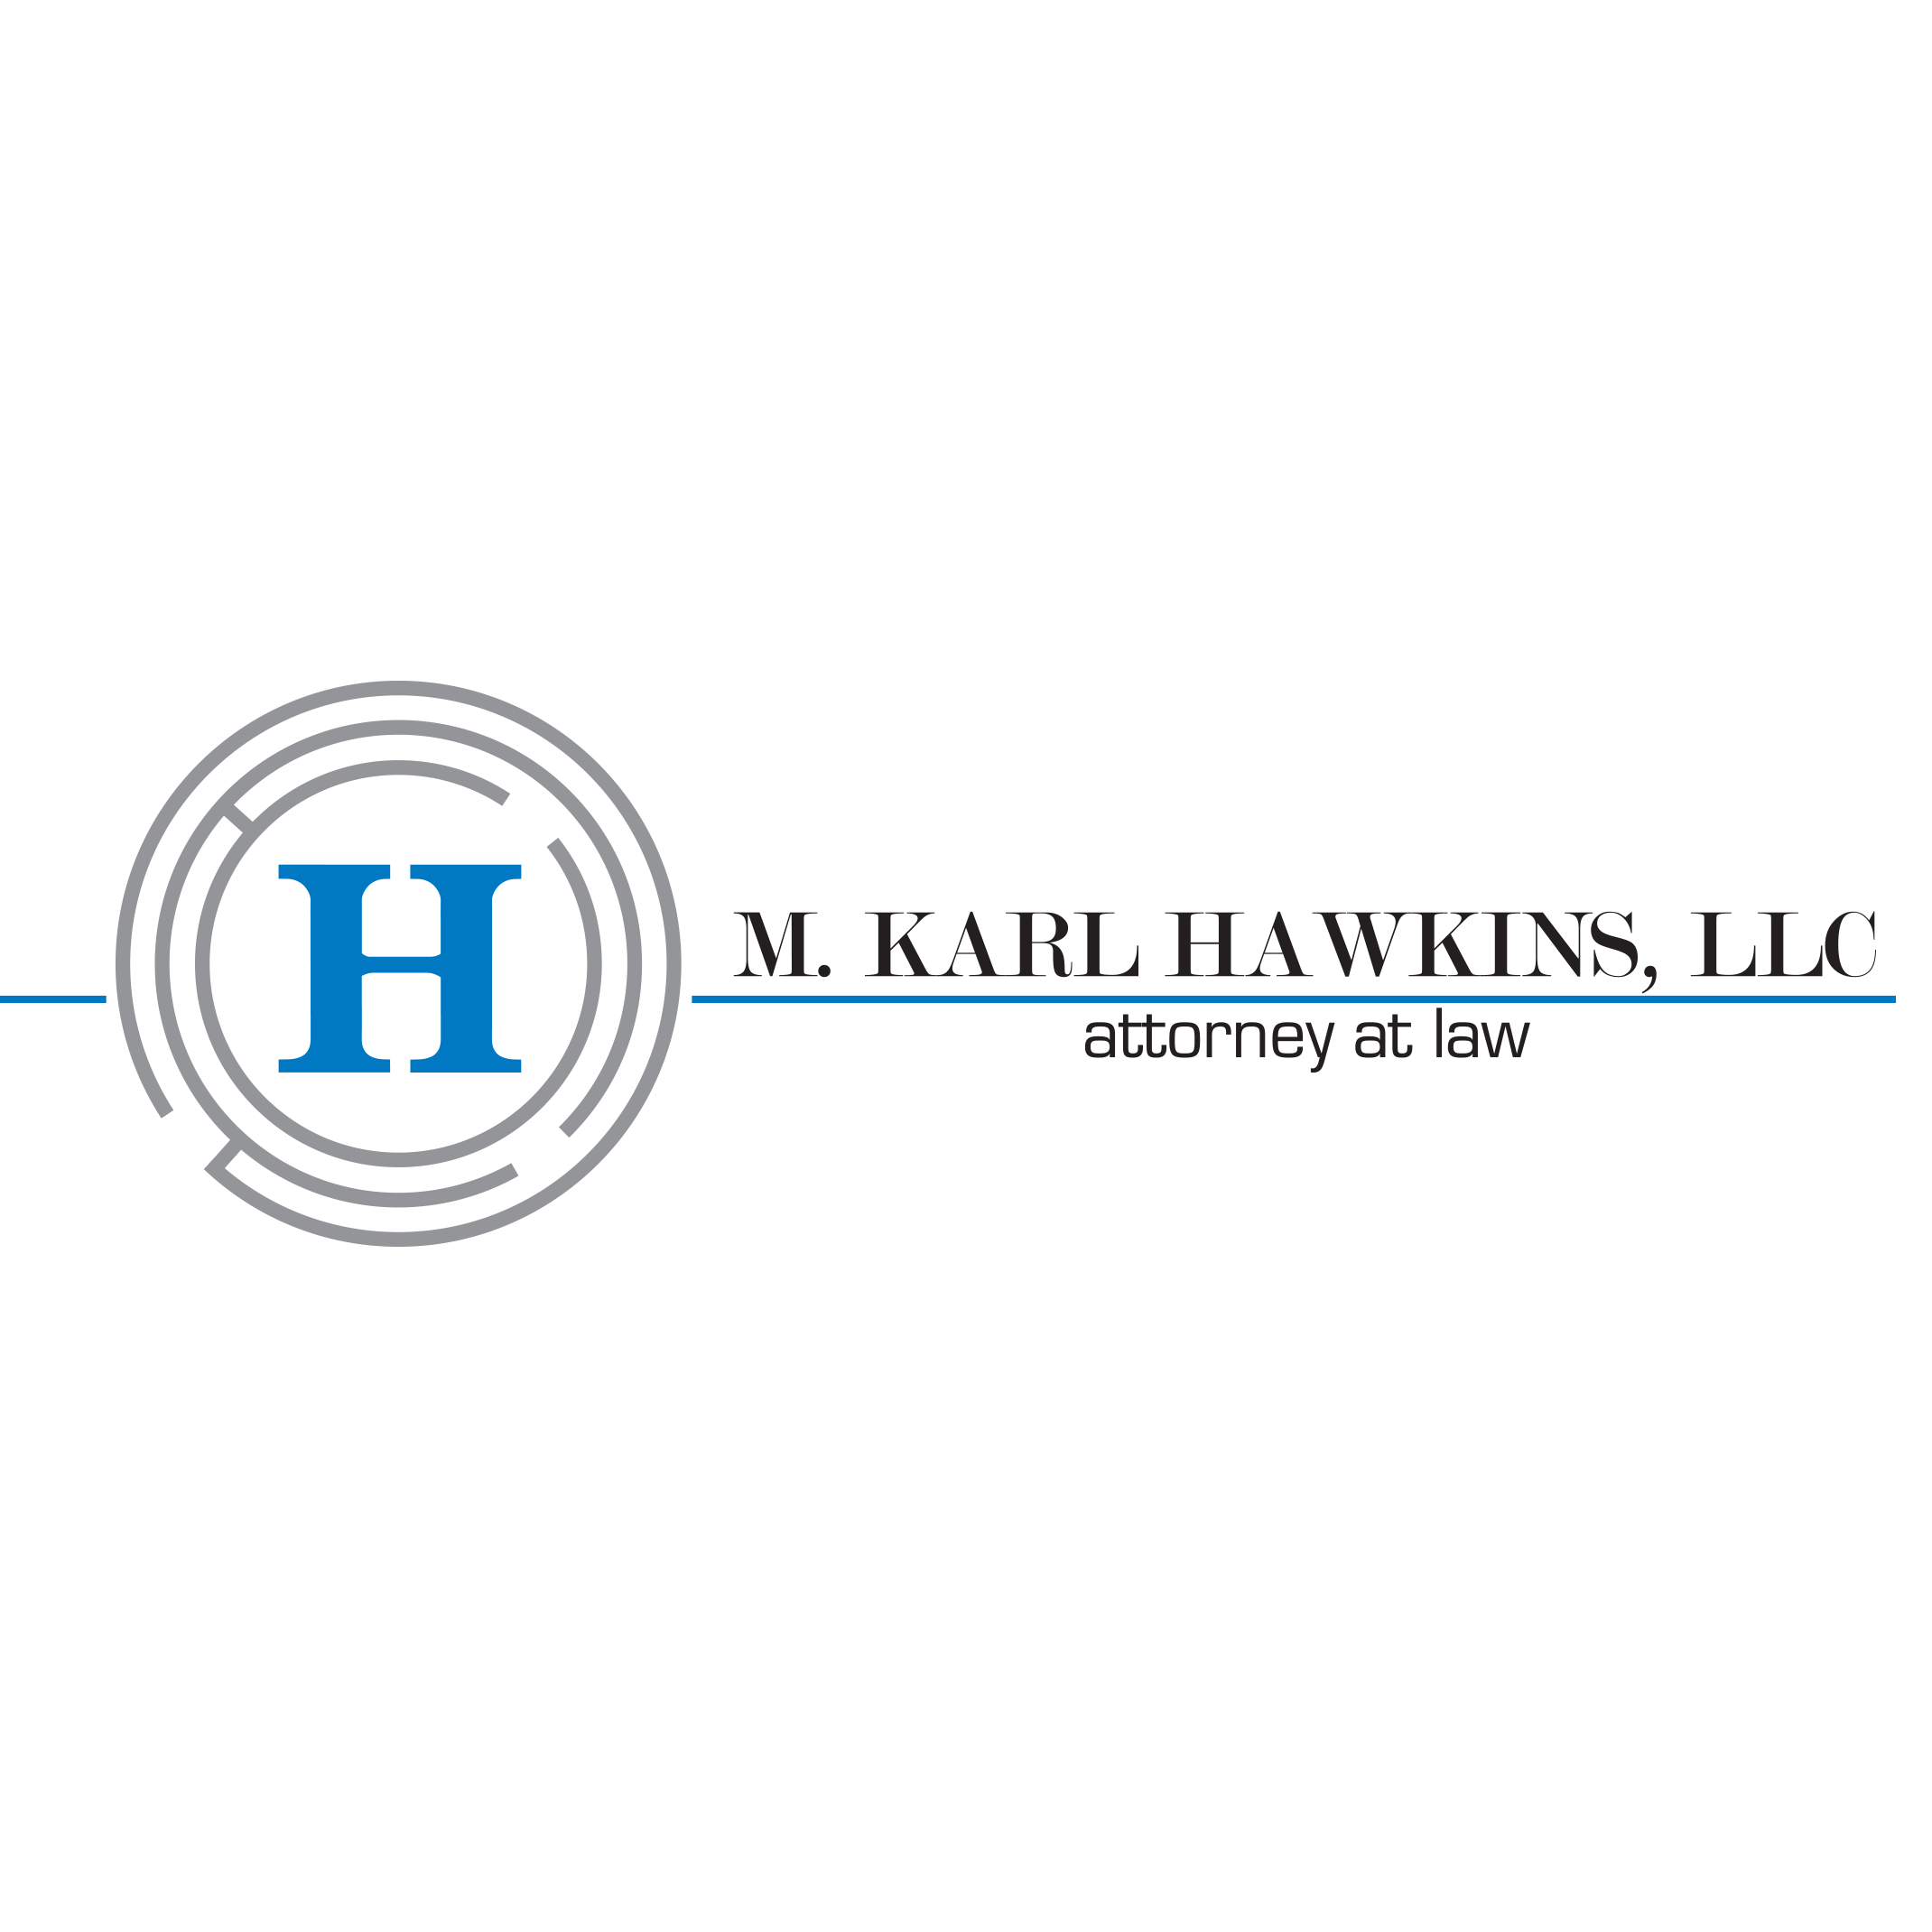 M. Karl Hawkins, LLC